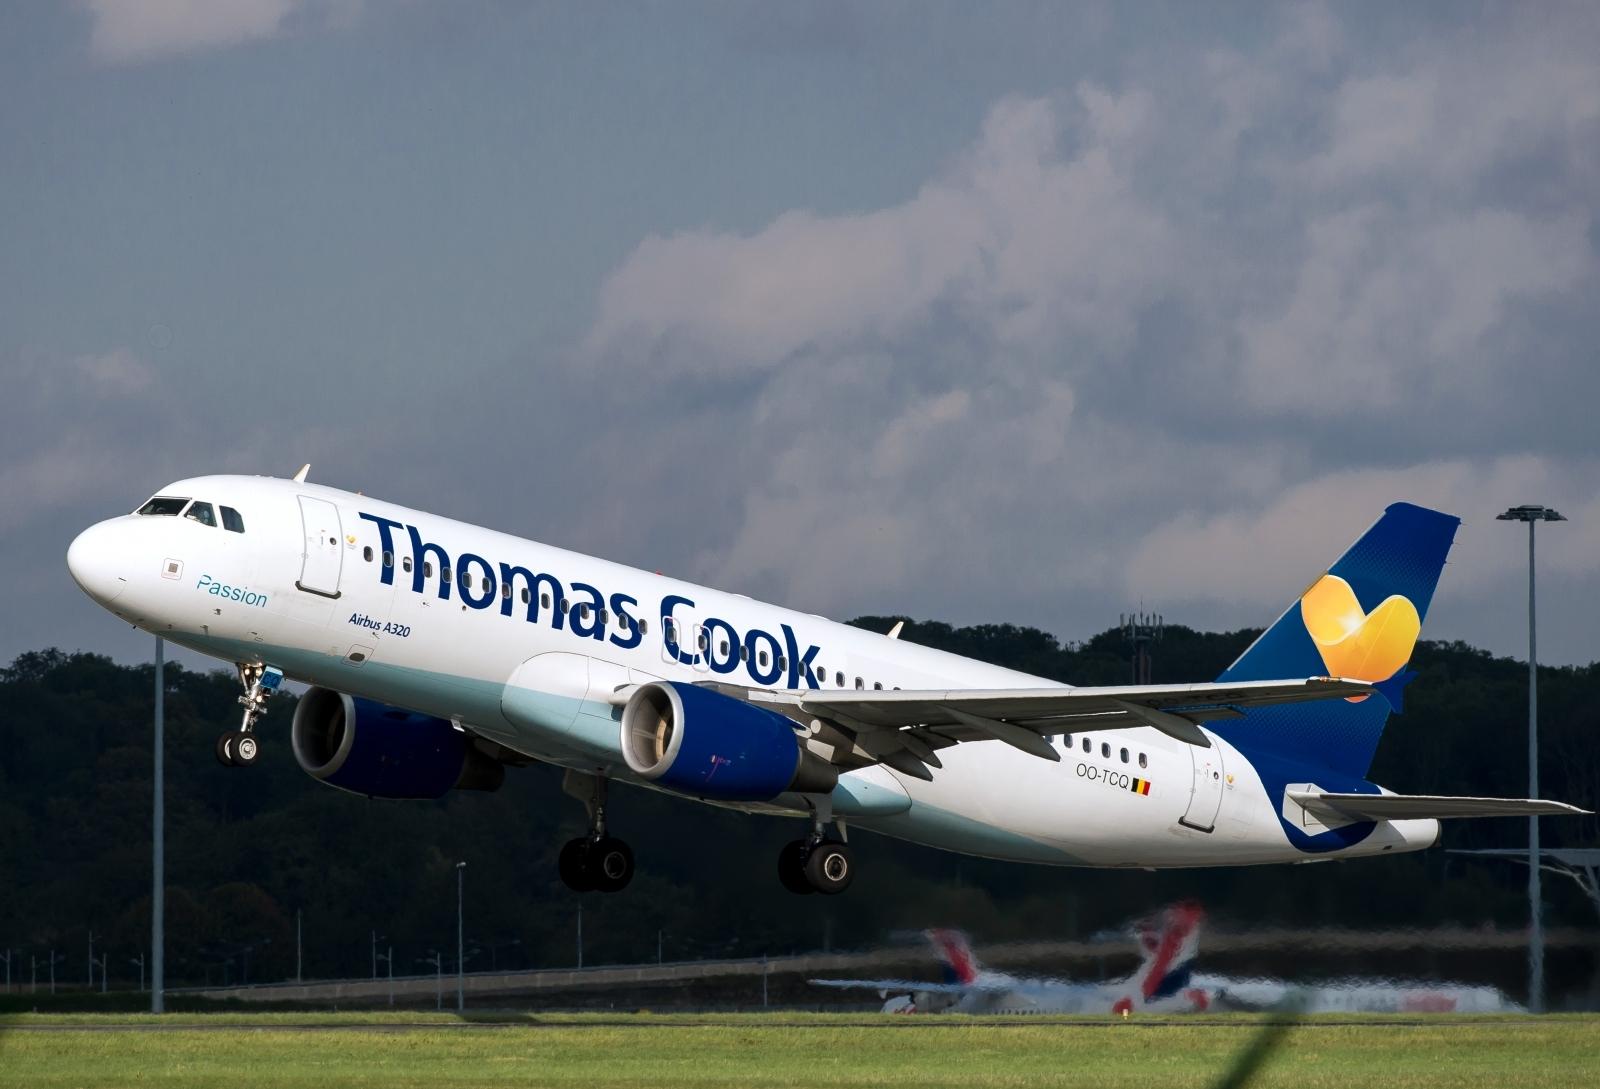 A Thomas Cook flight takes off